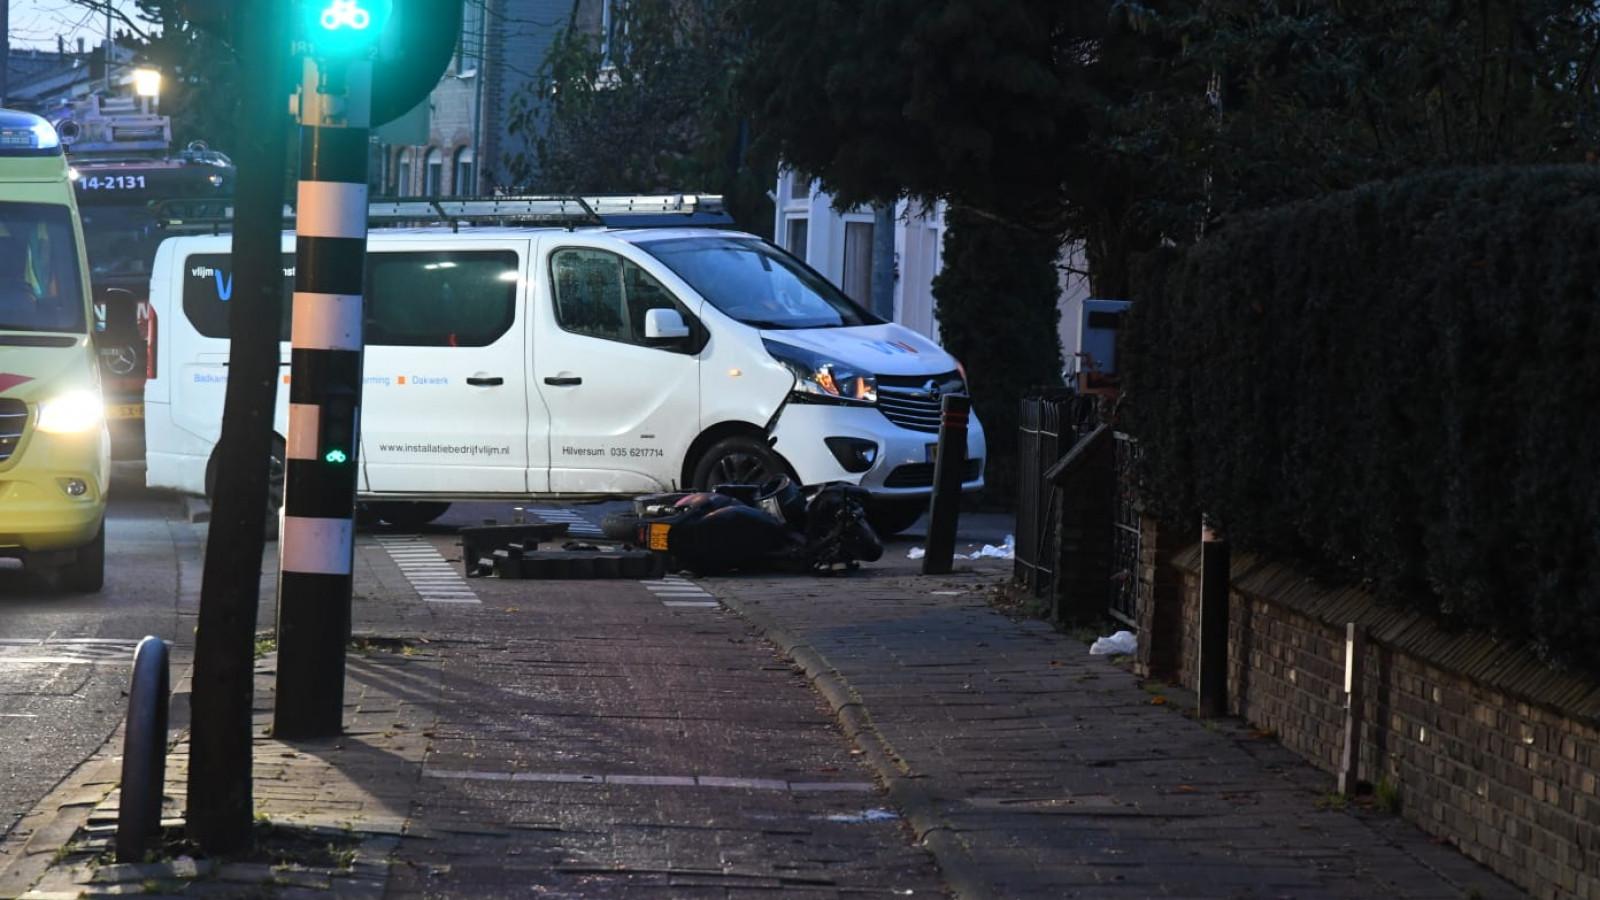 Scooteraar raakt bekneld onder bestelbus na ongeluk in Hilversum.